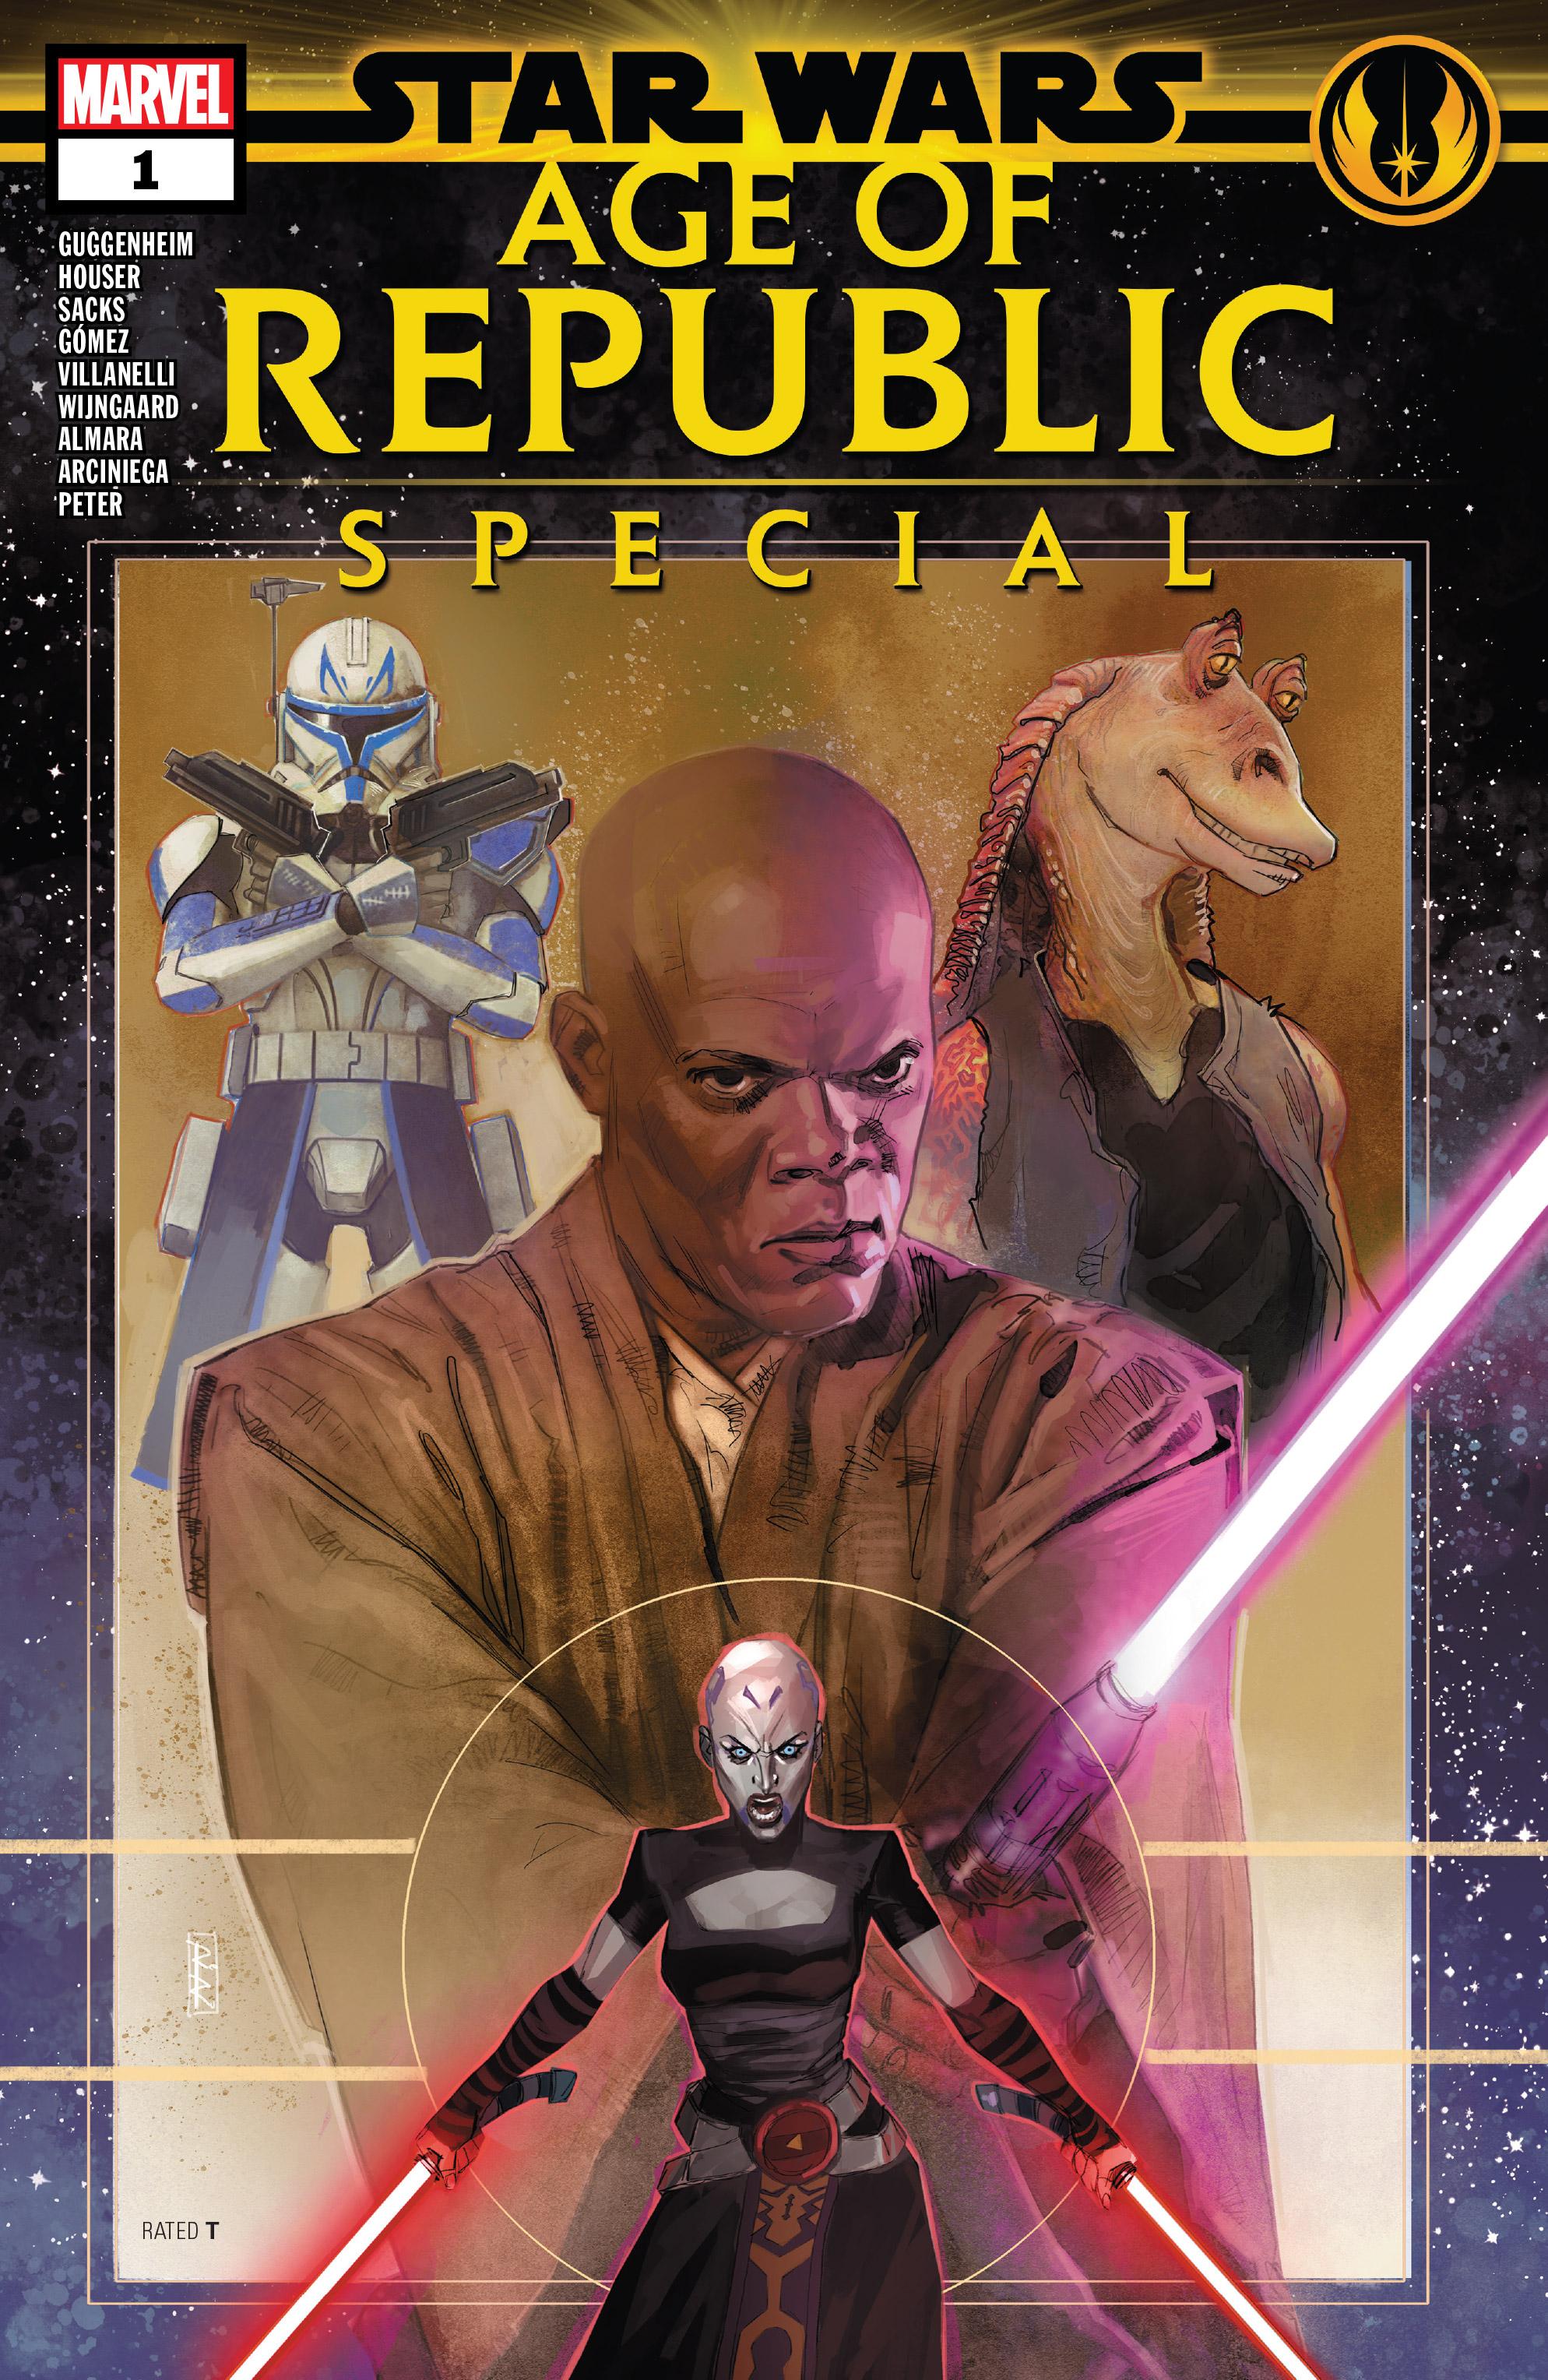 Age of Republic – Special